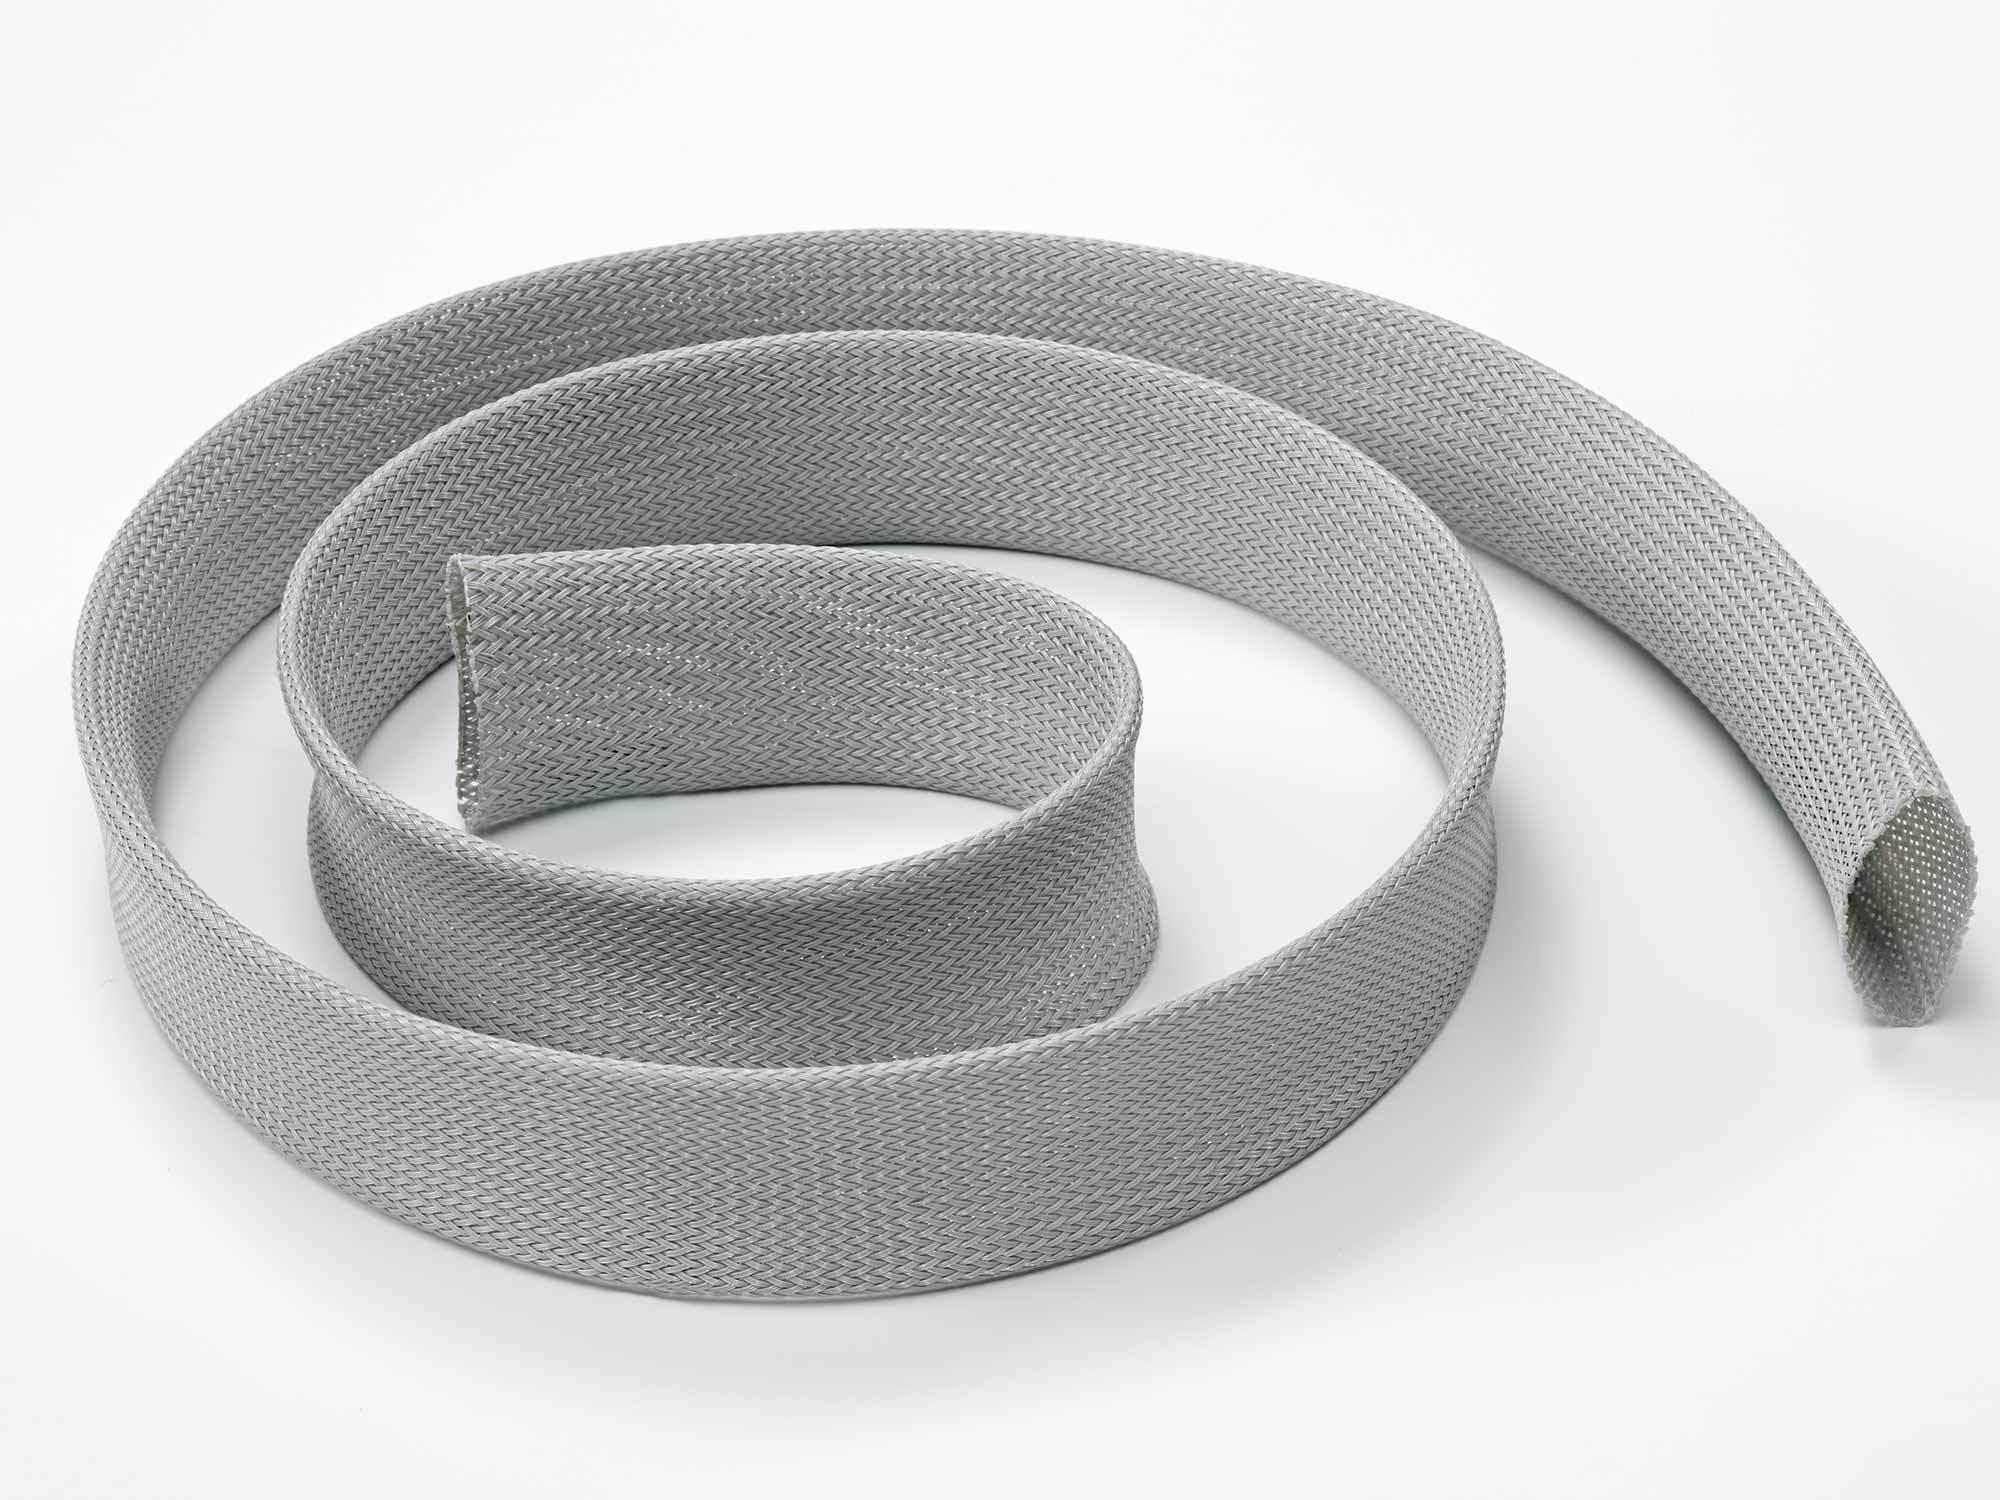 Inakustik Premium Cable Conduit 25-38mm, 38 m, 009210032